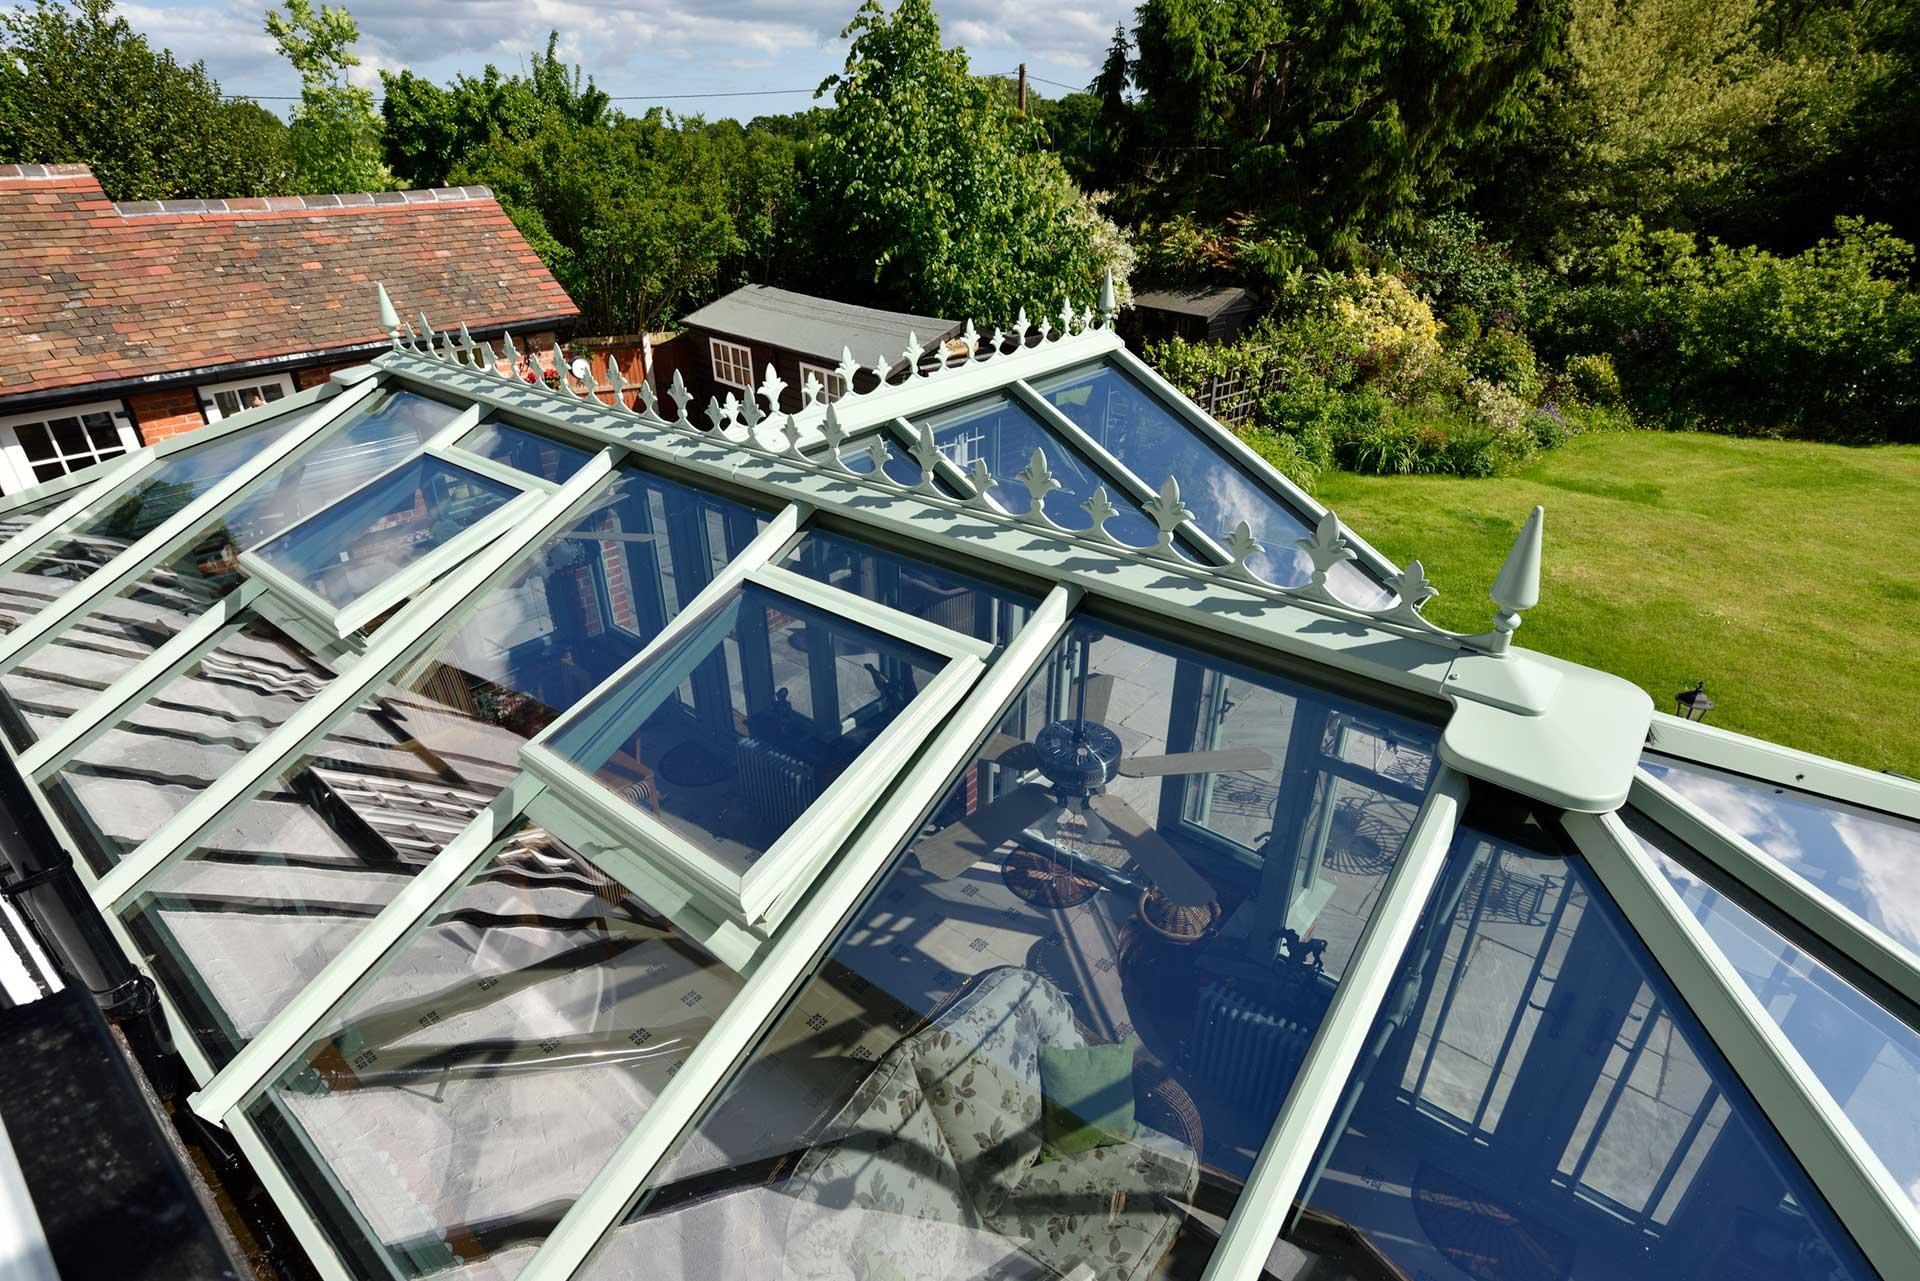 External Roof Vents